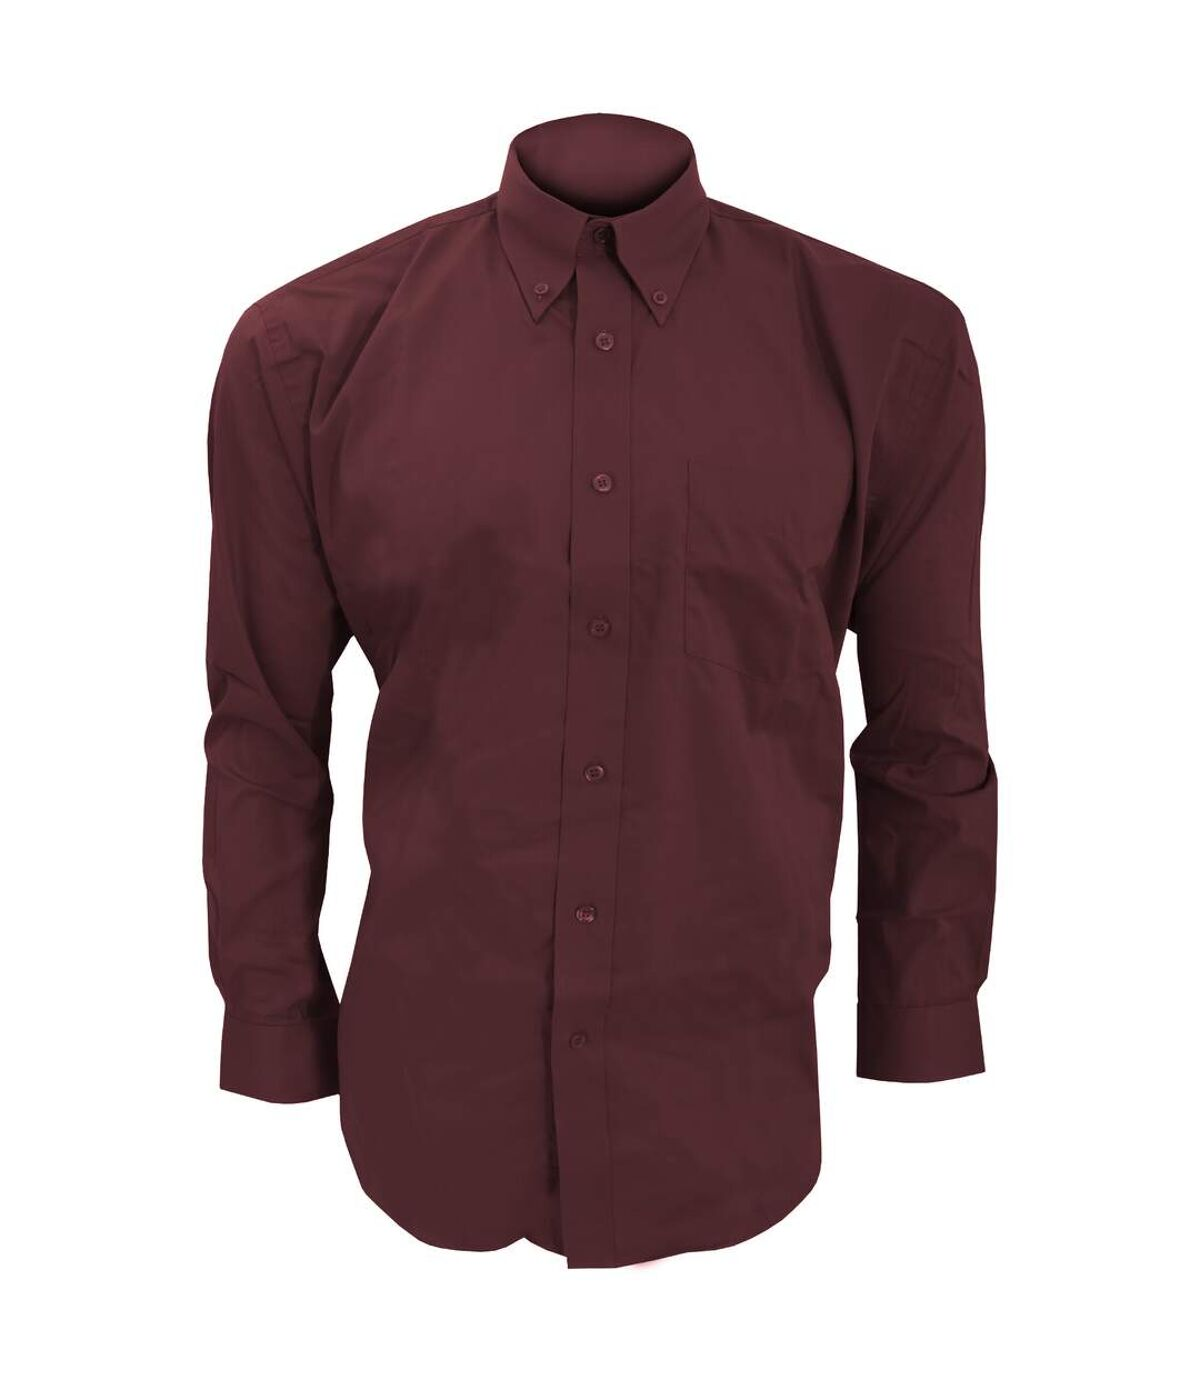 Kustom Kit Mens Long Sleeve Corporate Oxford Shirt (Black) - UTBC594